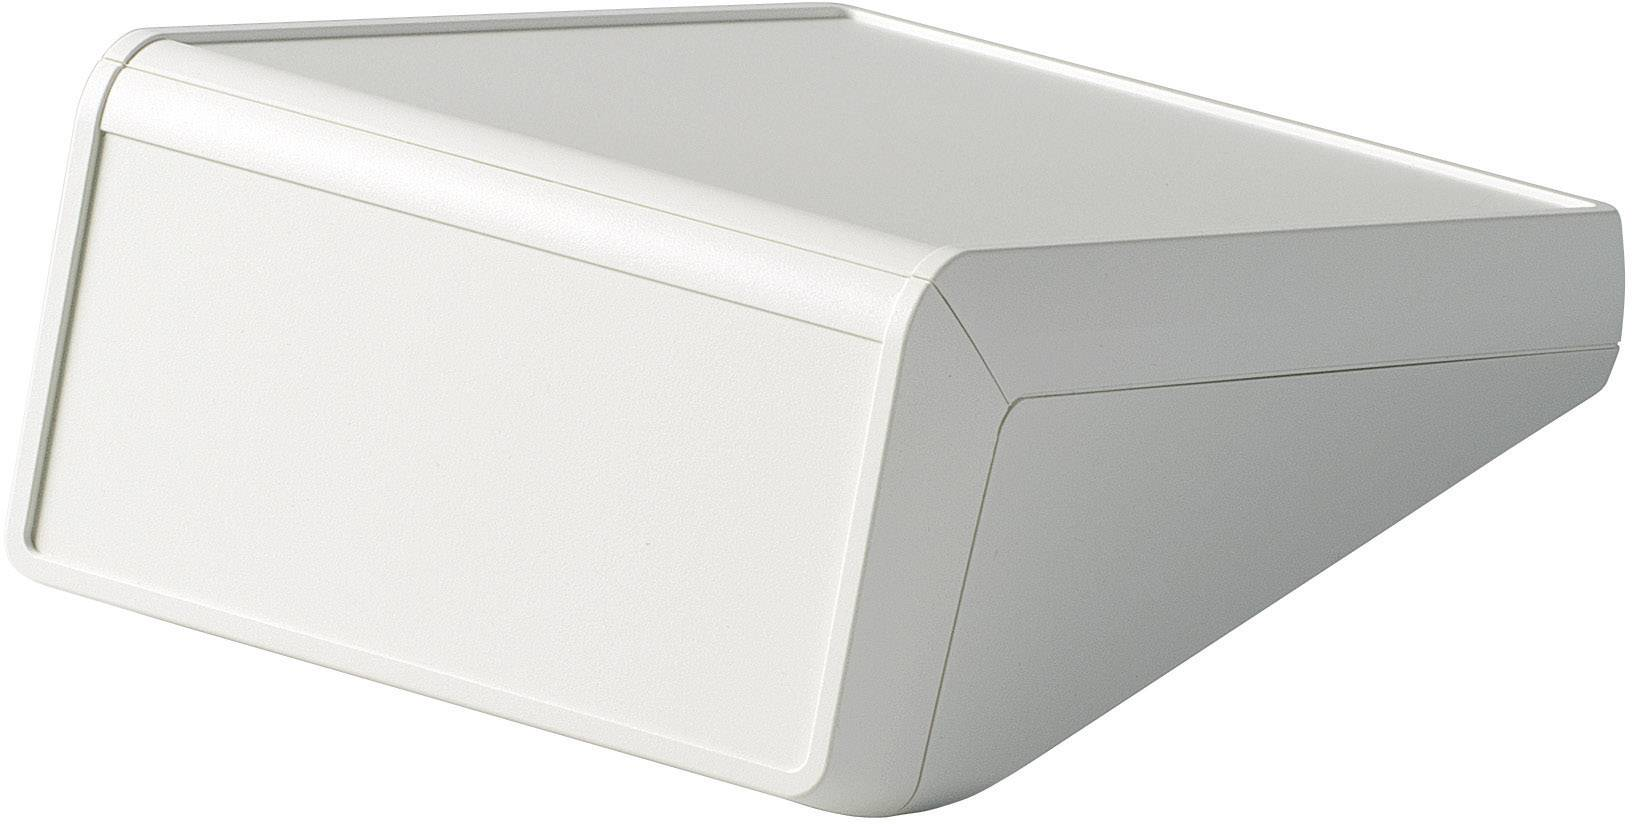 Pultové pouzdro ABS OKW D4056317, (d x š x v) 148 x 210 x 80/25 mm, šedá